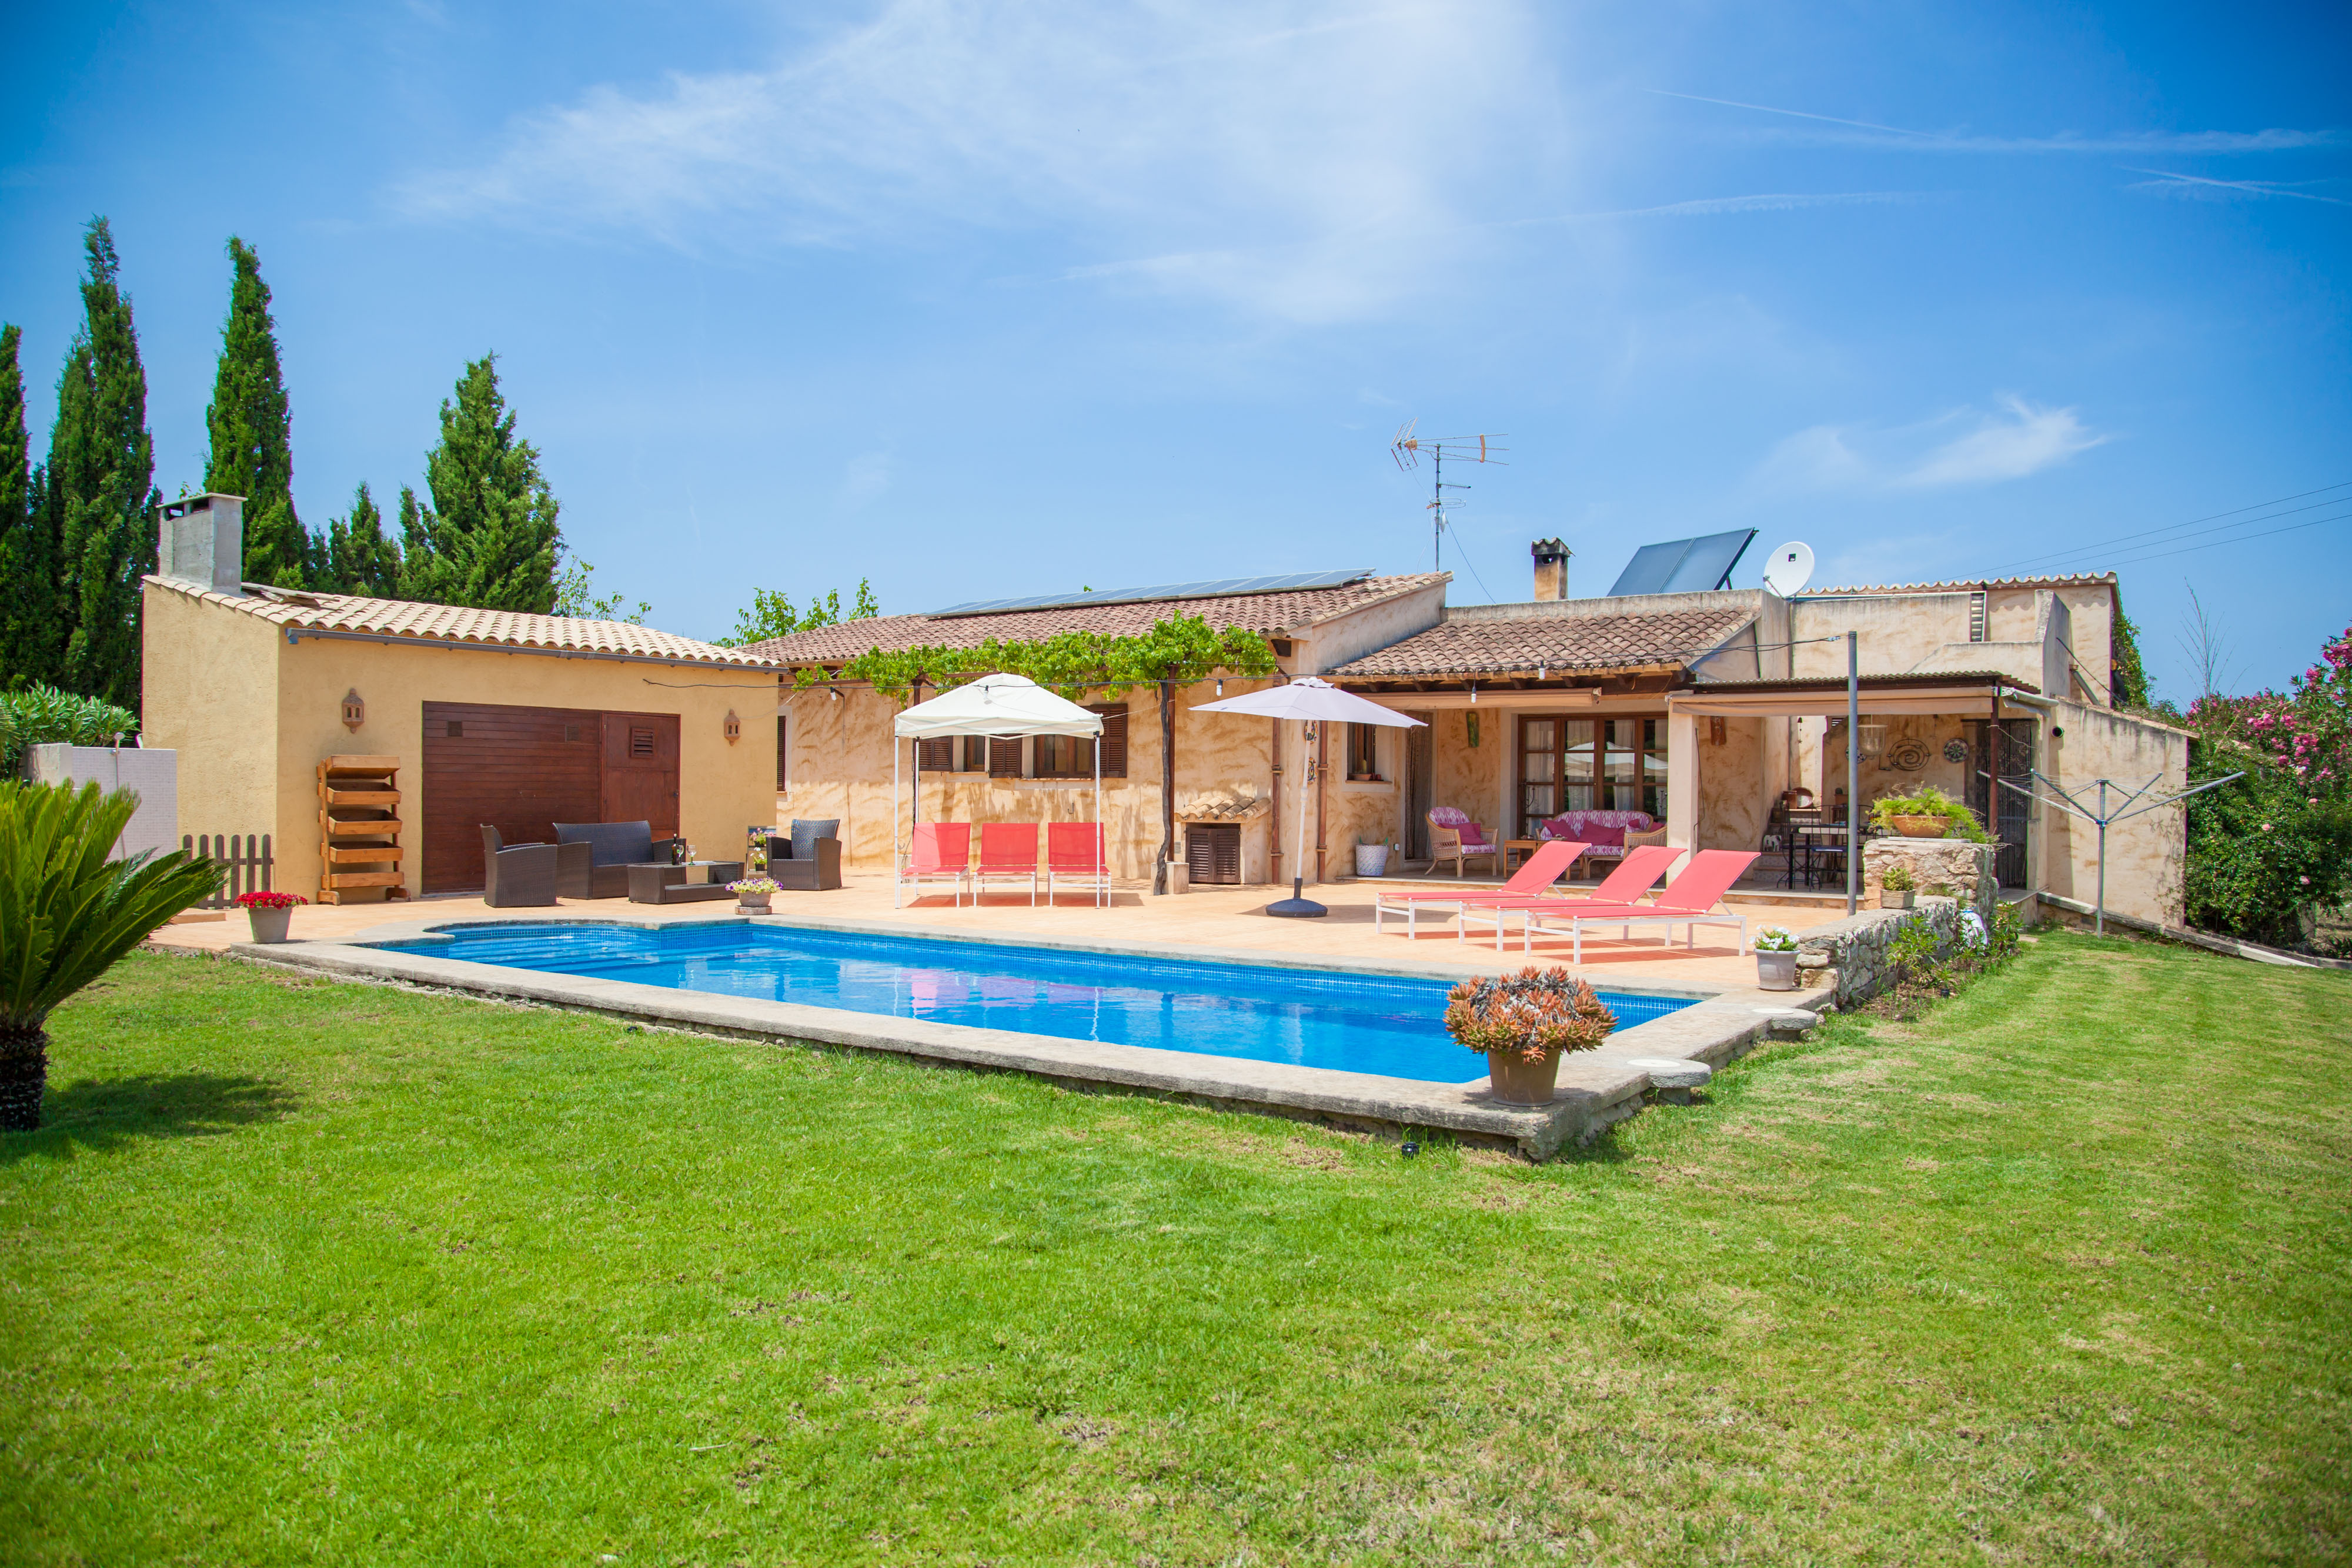 Ferienhaus SA CORBAIA (2020559), Arta, Mallorca, Balearische Inseln, Spanien, Bild 1